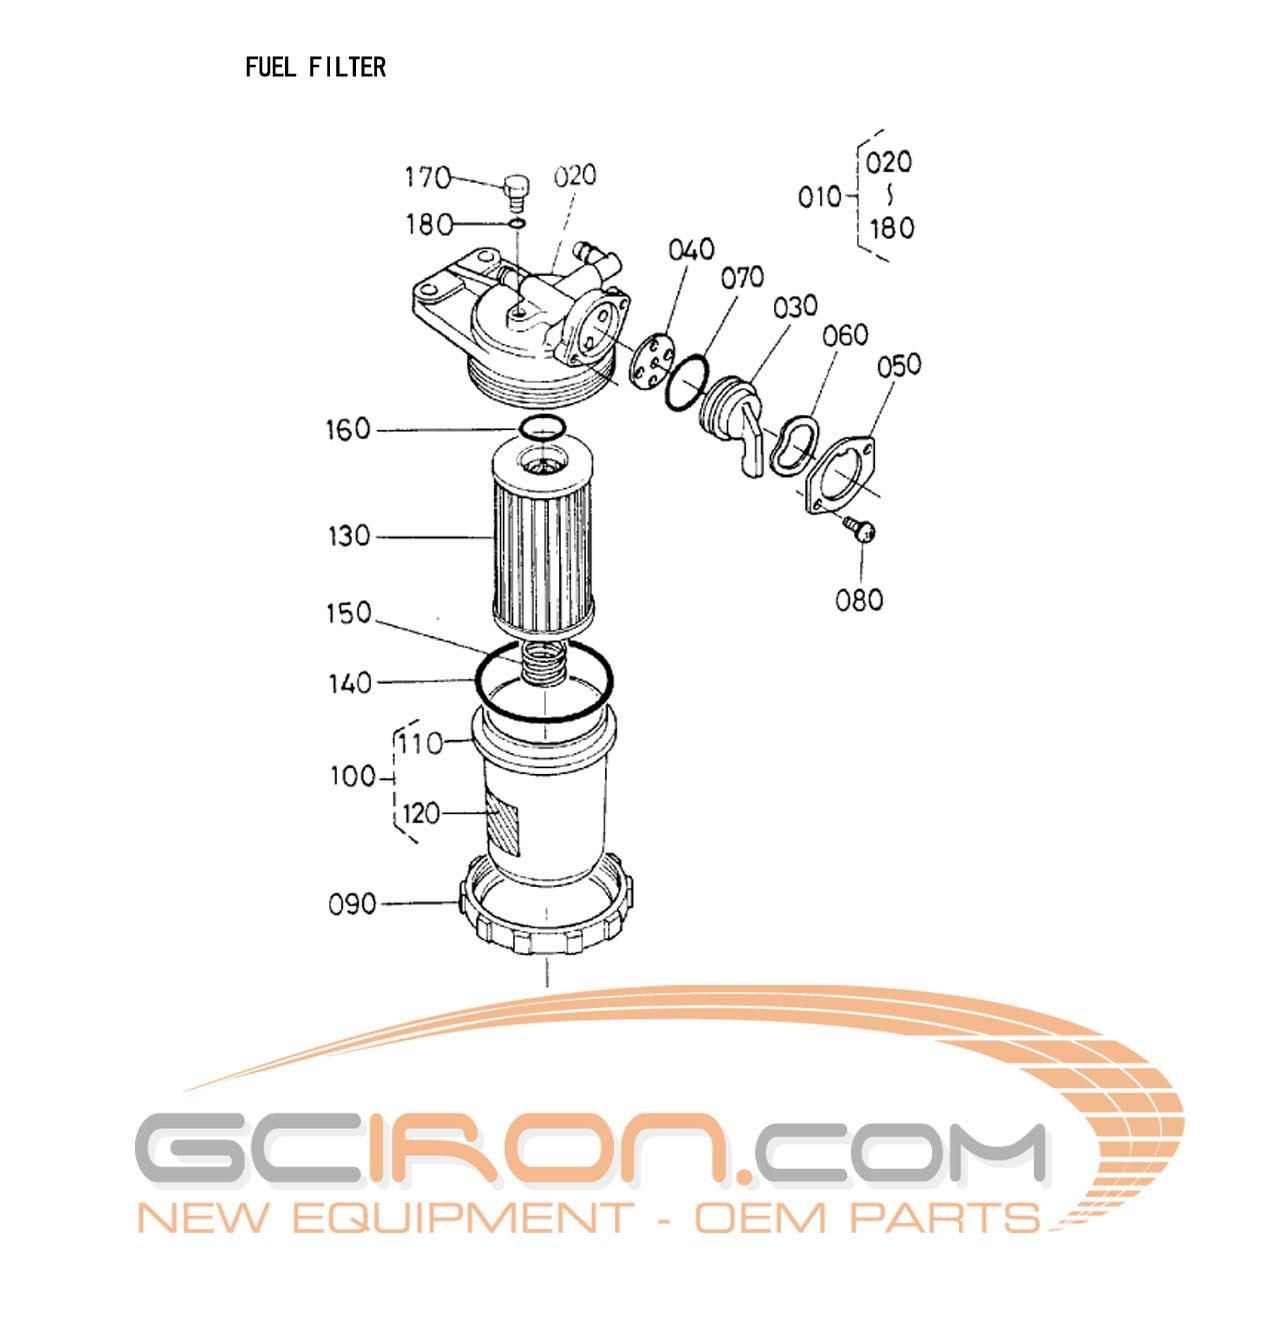 Construction Equipment Parts Jlg From Gcironcom Kubota Fuel Filters